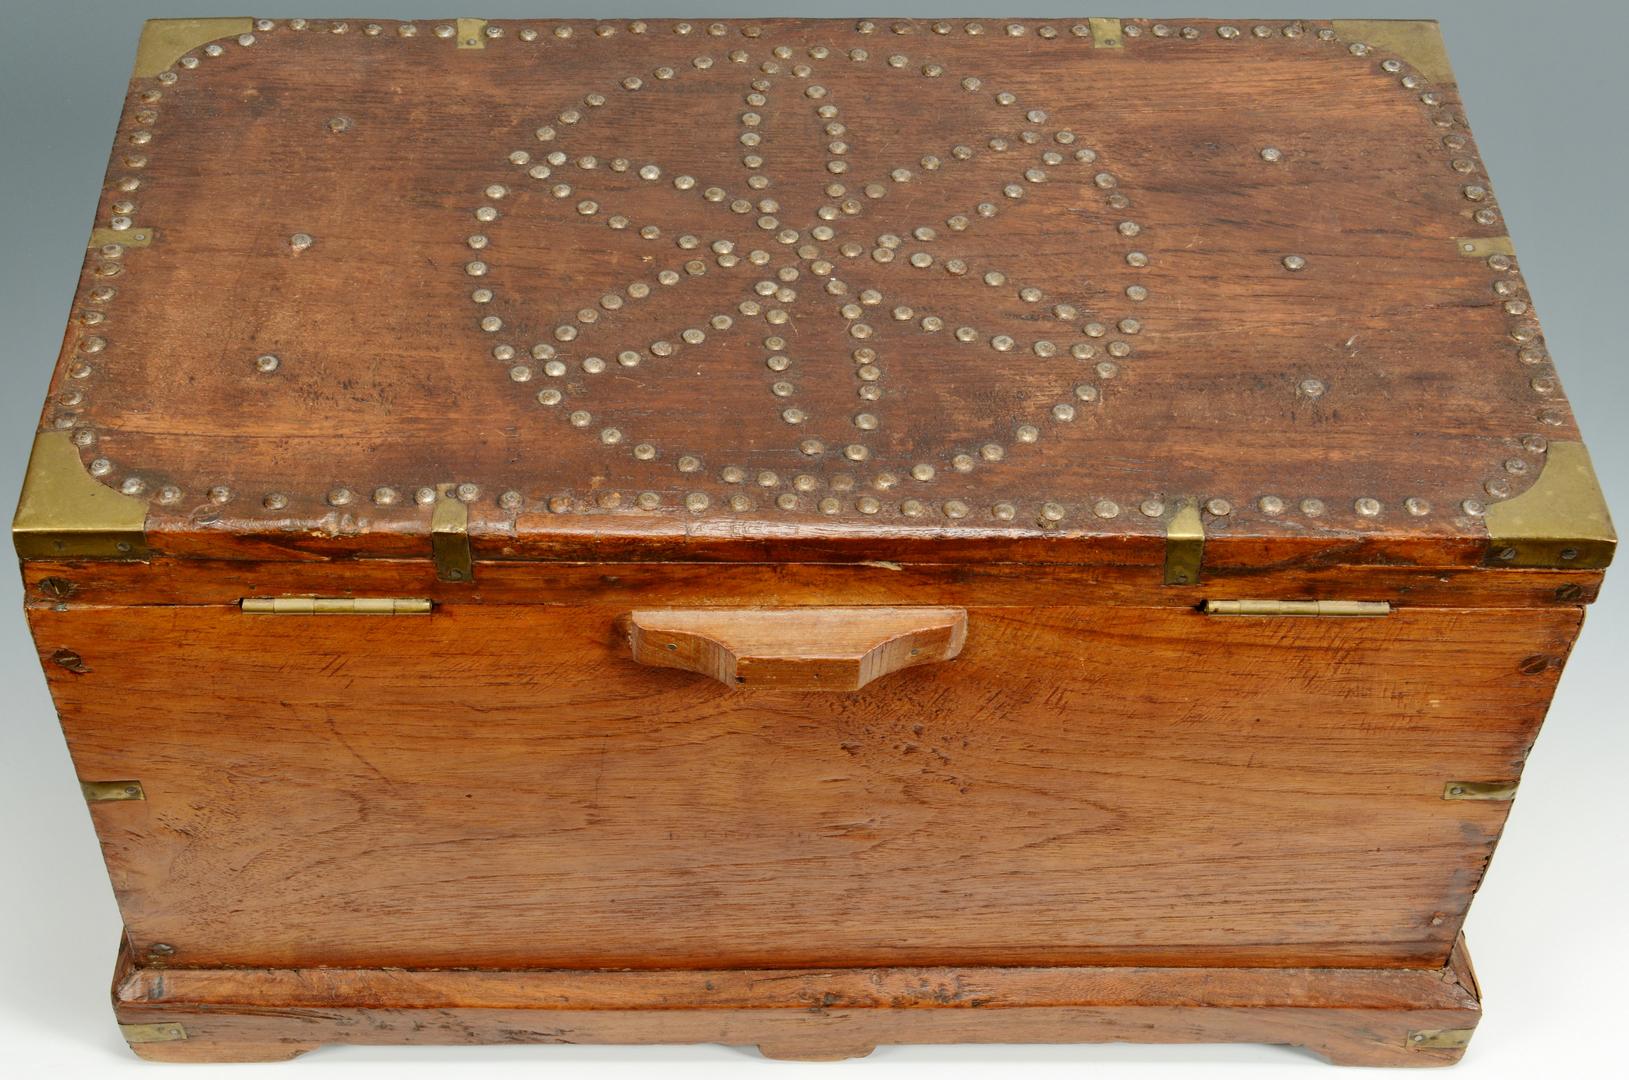 Lot 3088336: Diminutive Storage Chest w/ Brass Tack Decoration